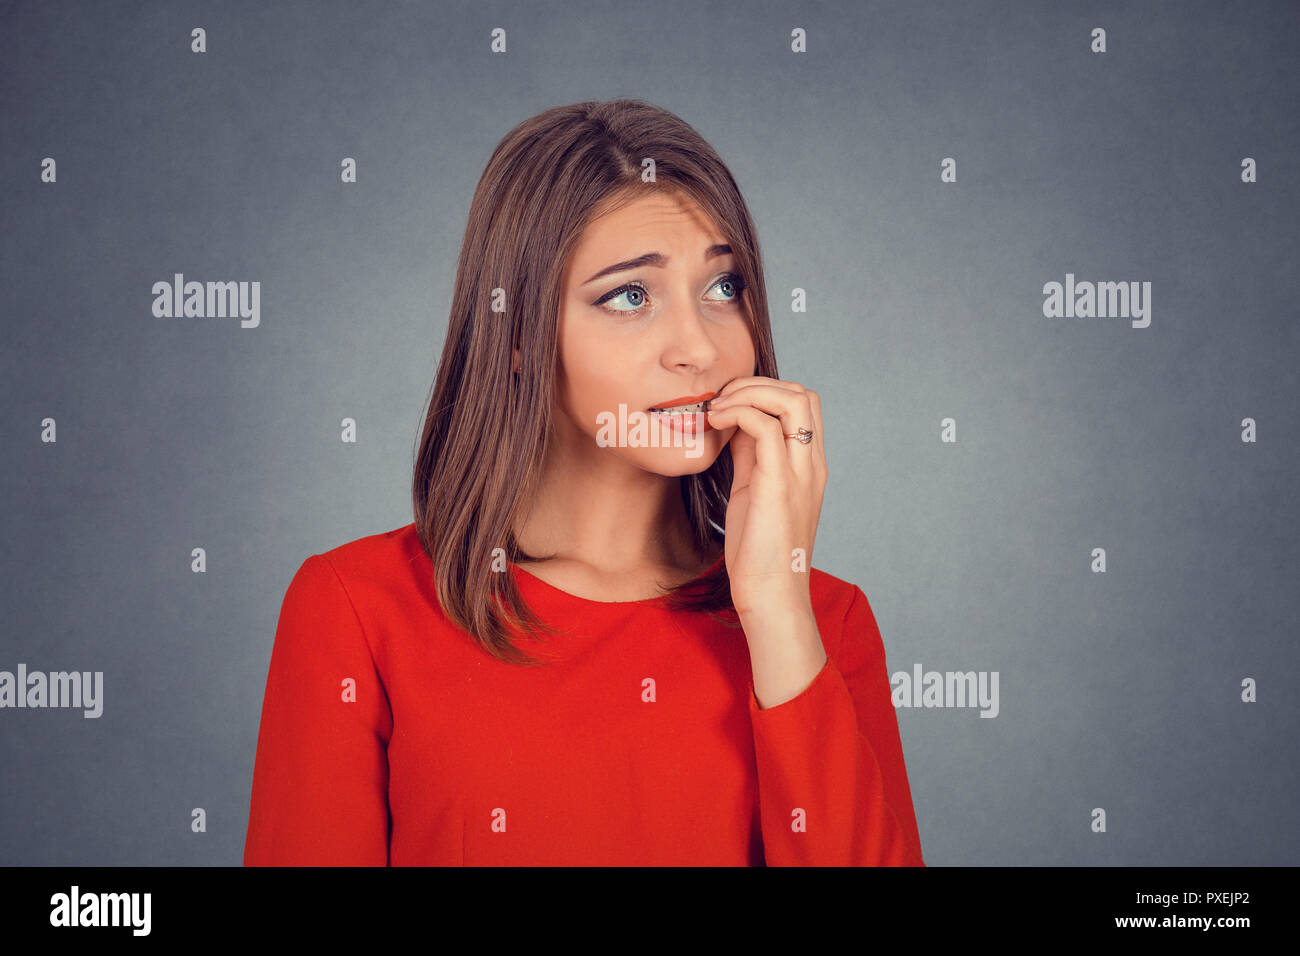 nervous looking woman biting her fingernails craving something - Stock Image